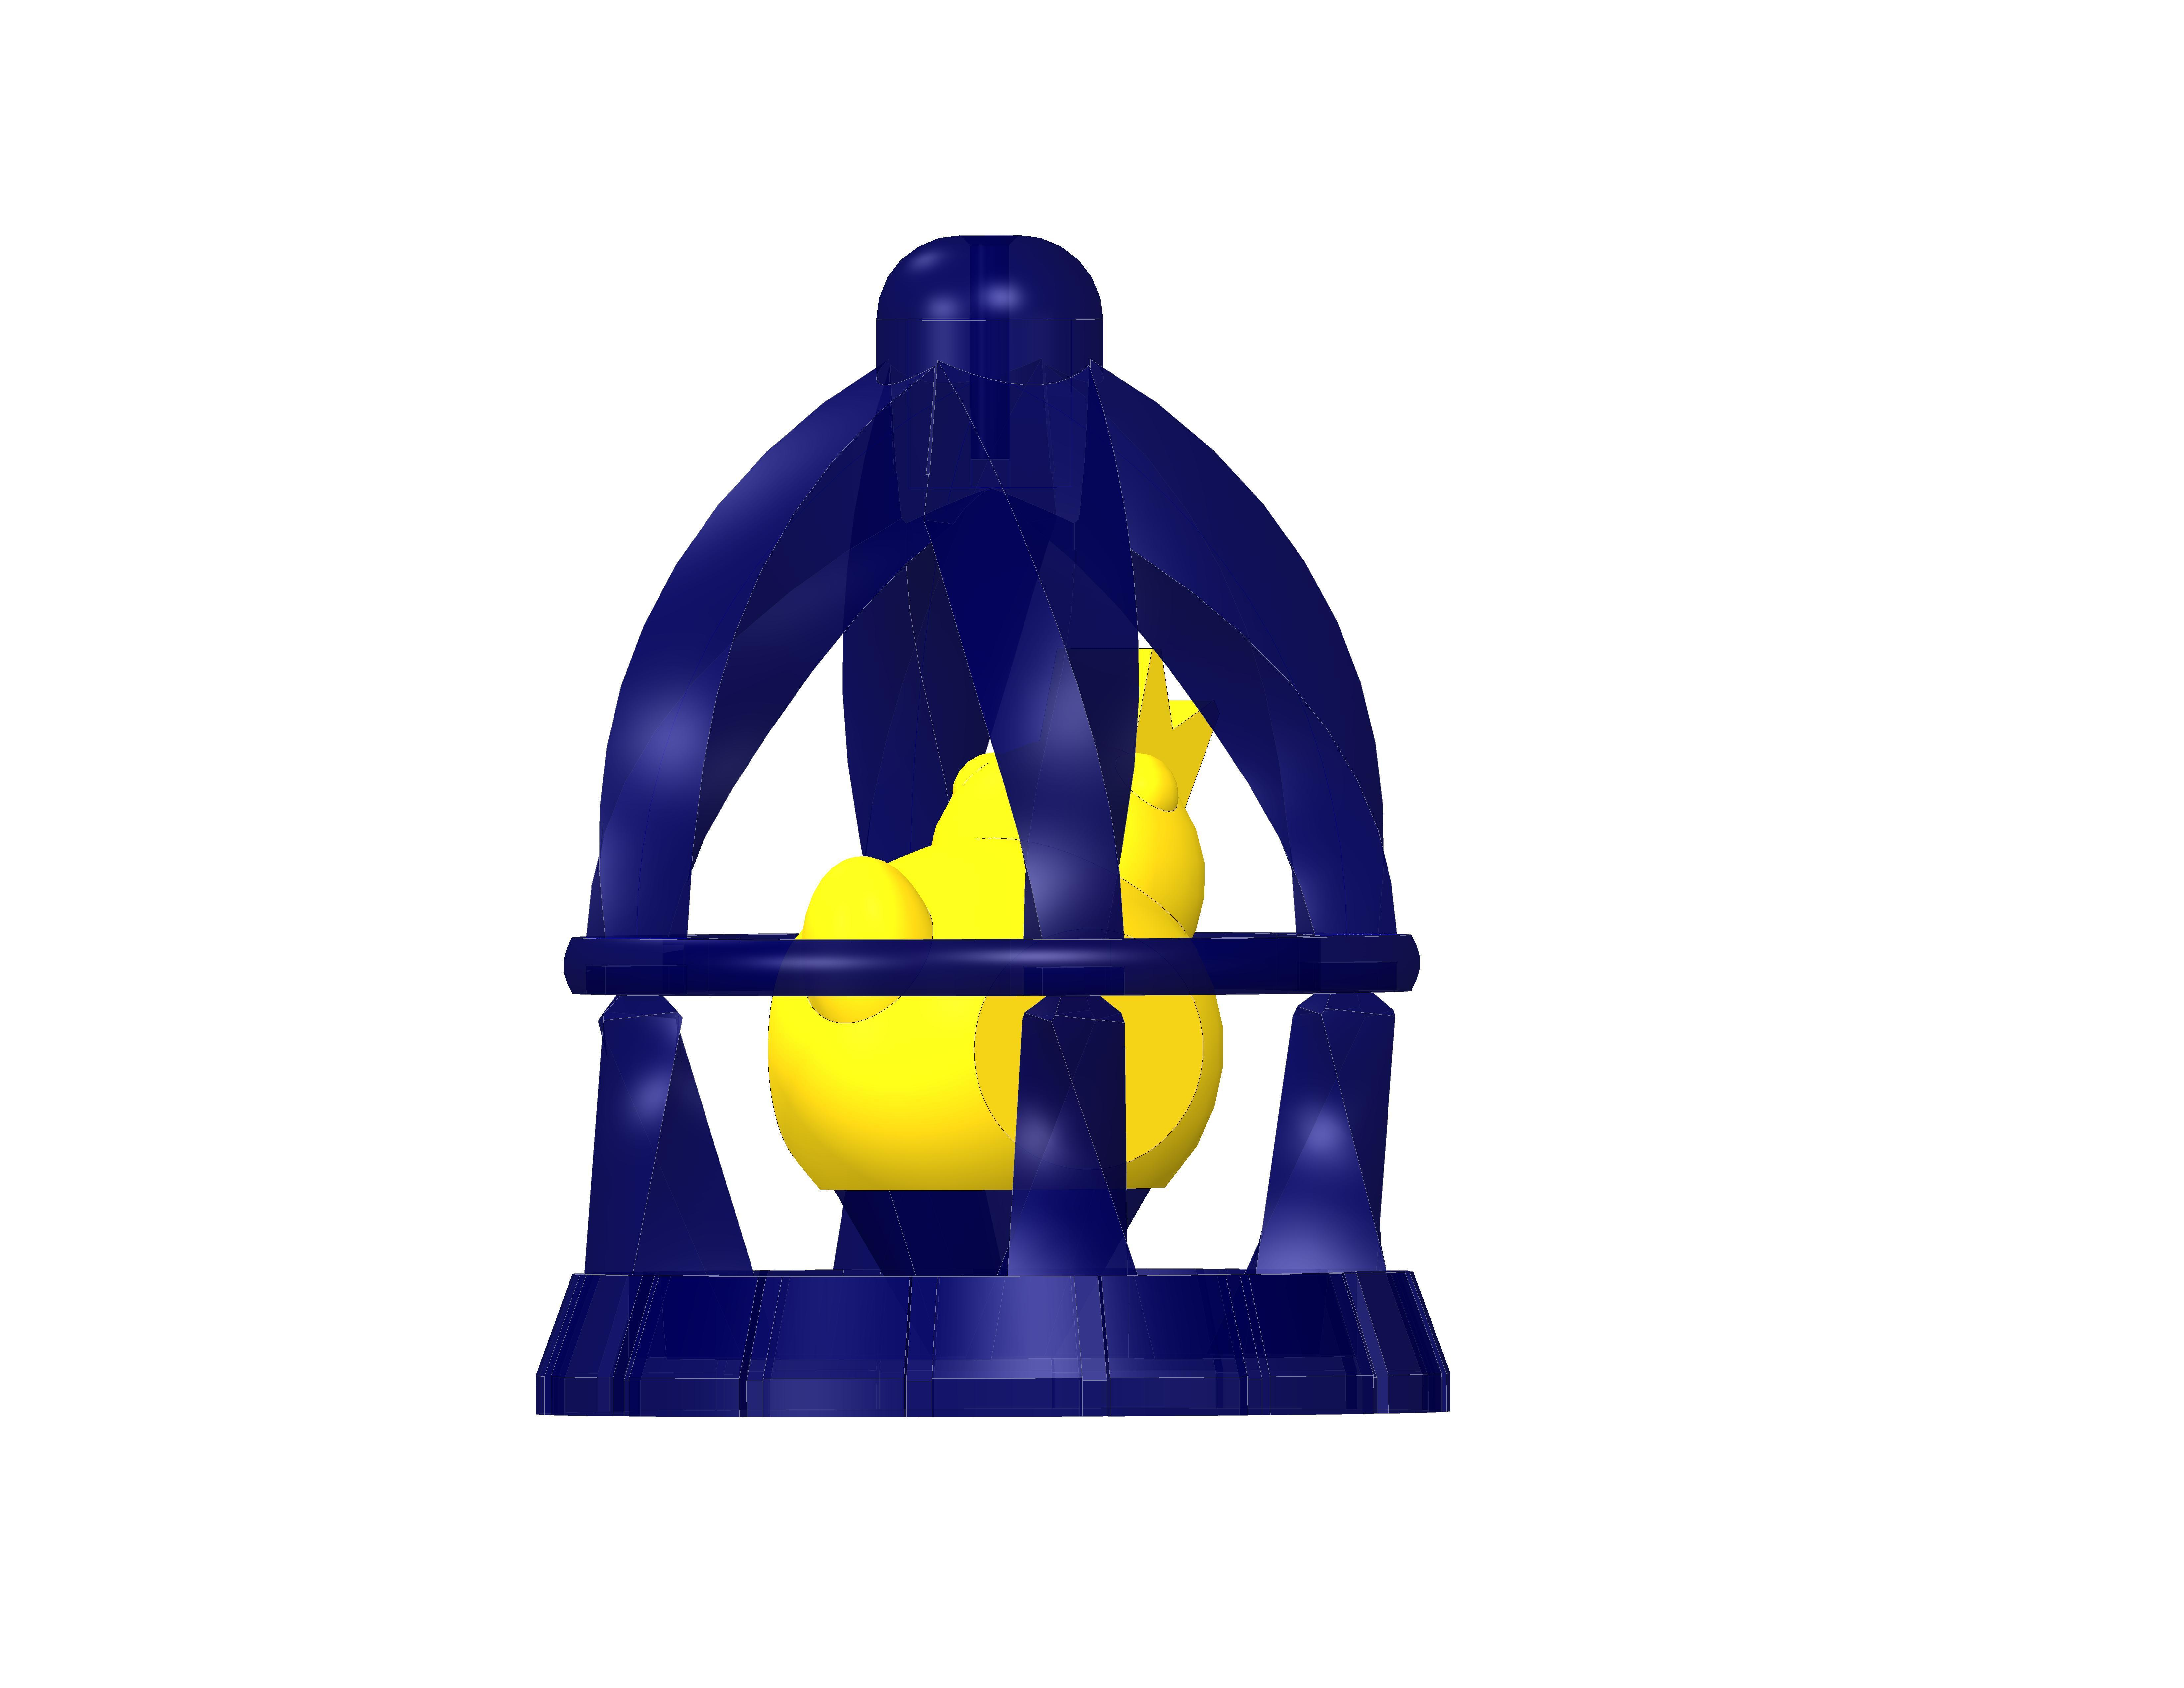 plp-cage-oiseau-.jpg Download free STL file PLP BIRD IN A CAGE • 3D printer model, PLP